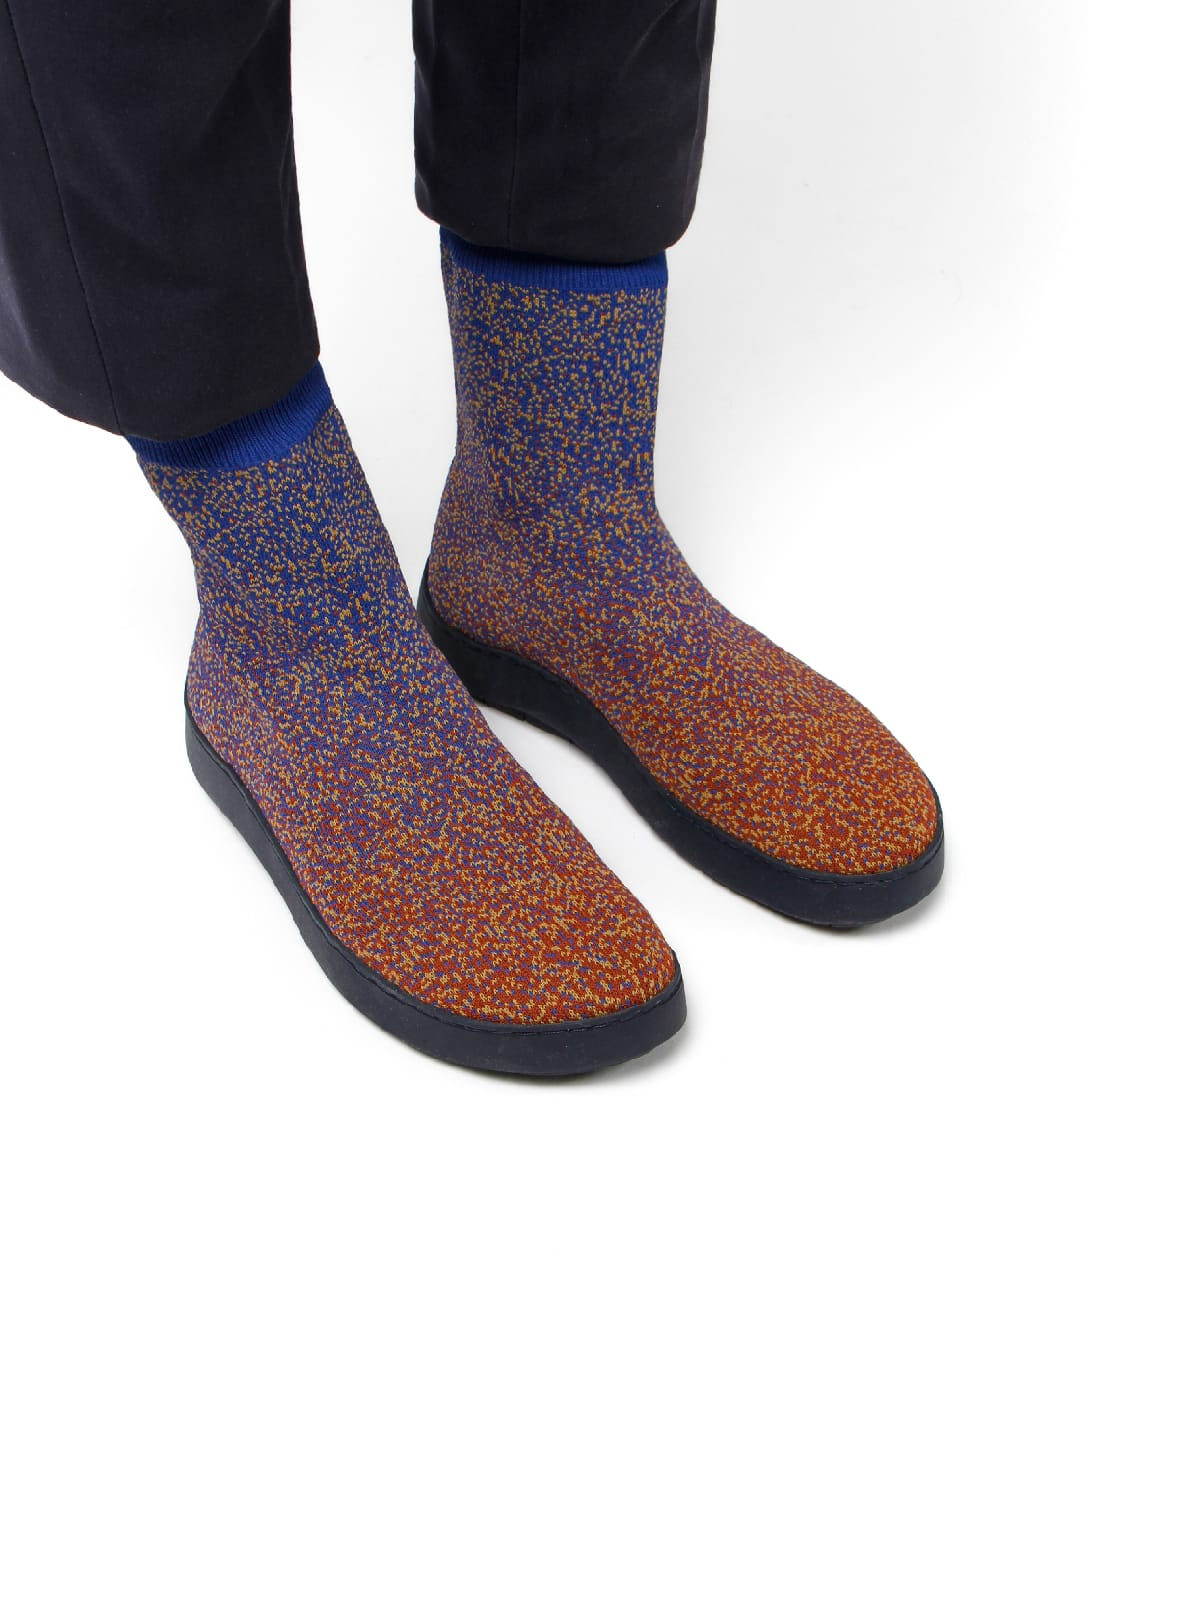 3D knitted sockboot Sparkle foxy schräg K